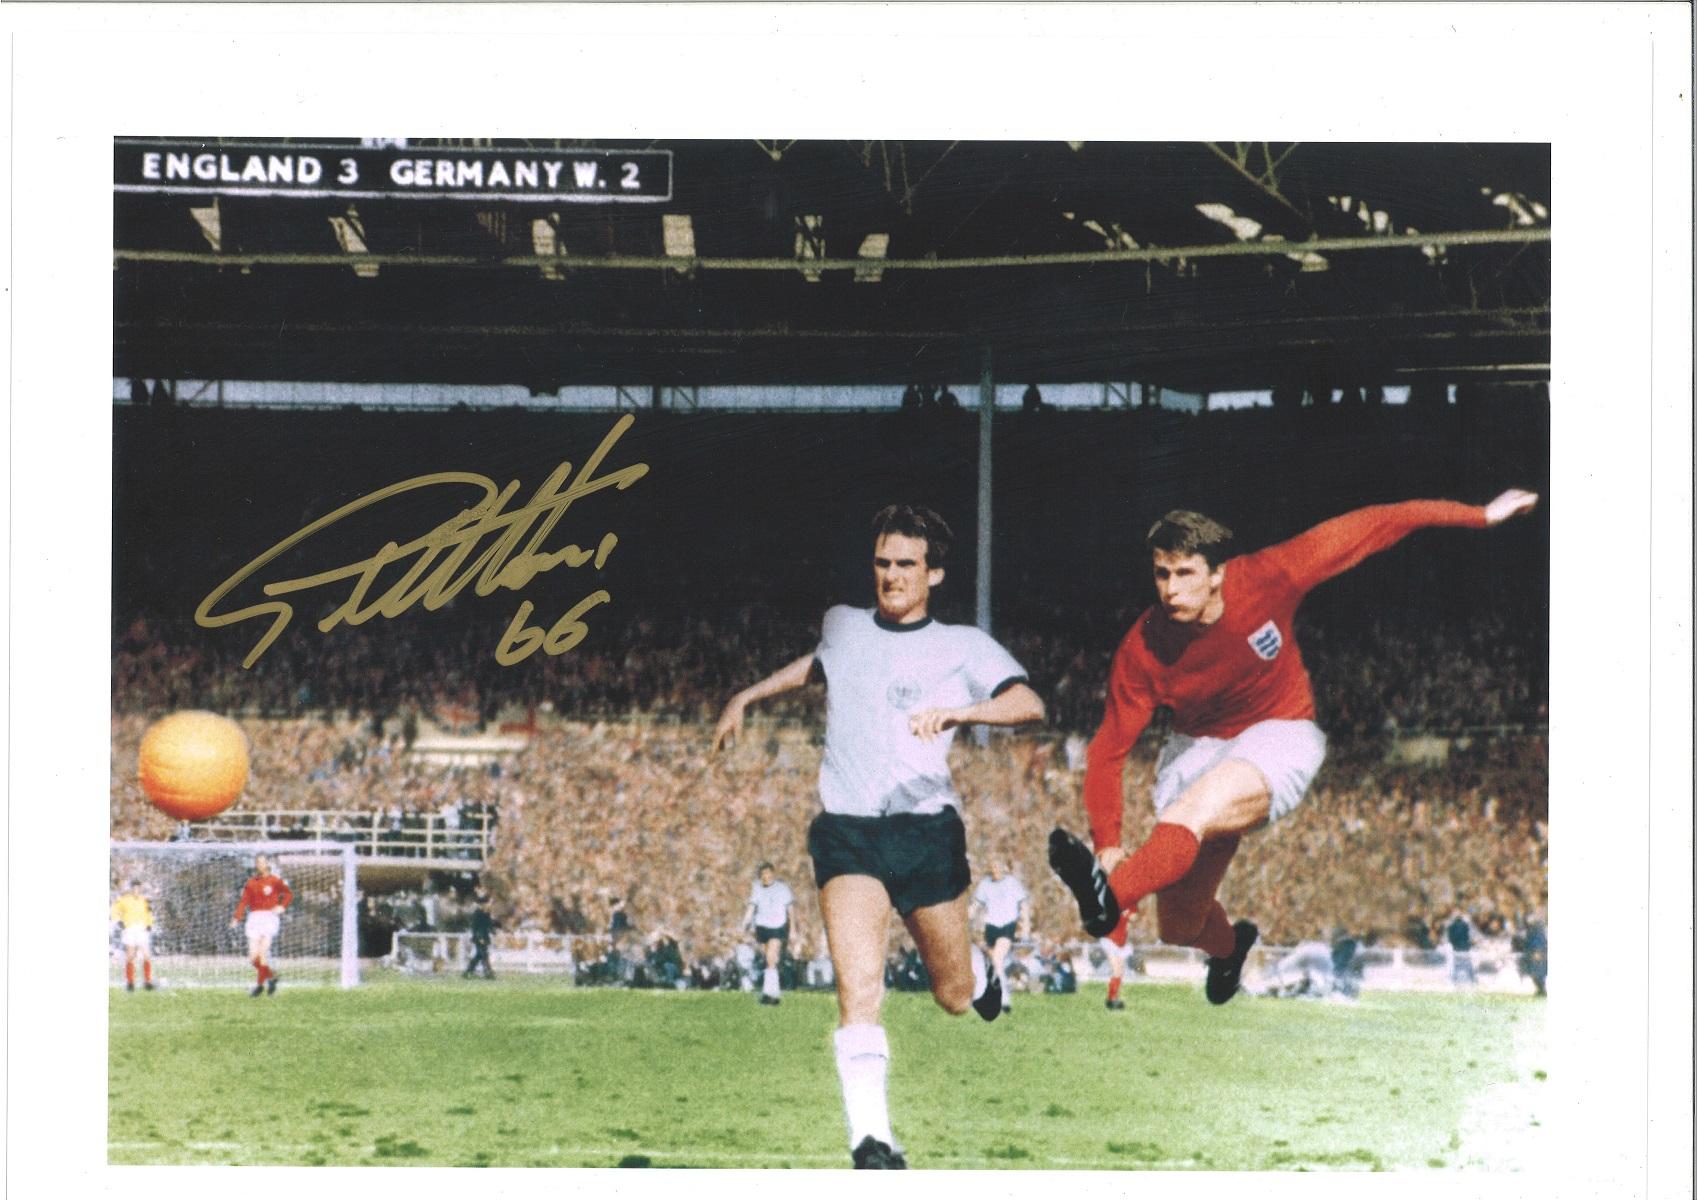 Geoff Hurst Signed 12x16 England 1966 World Cup Final Artist Print. Good Condition. All autographs